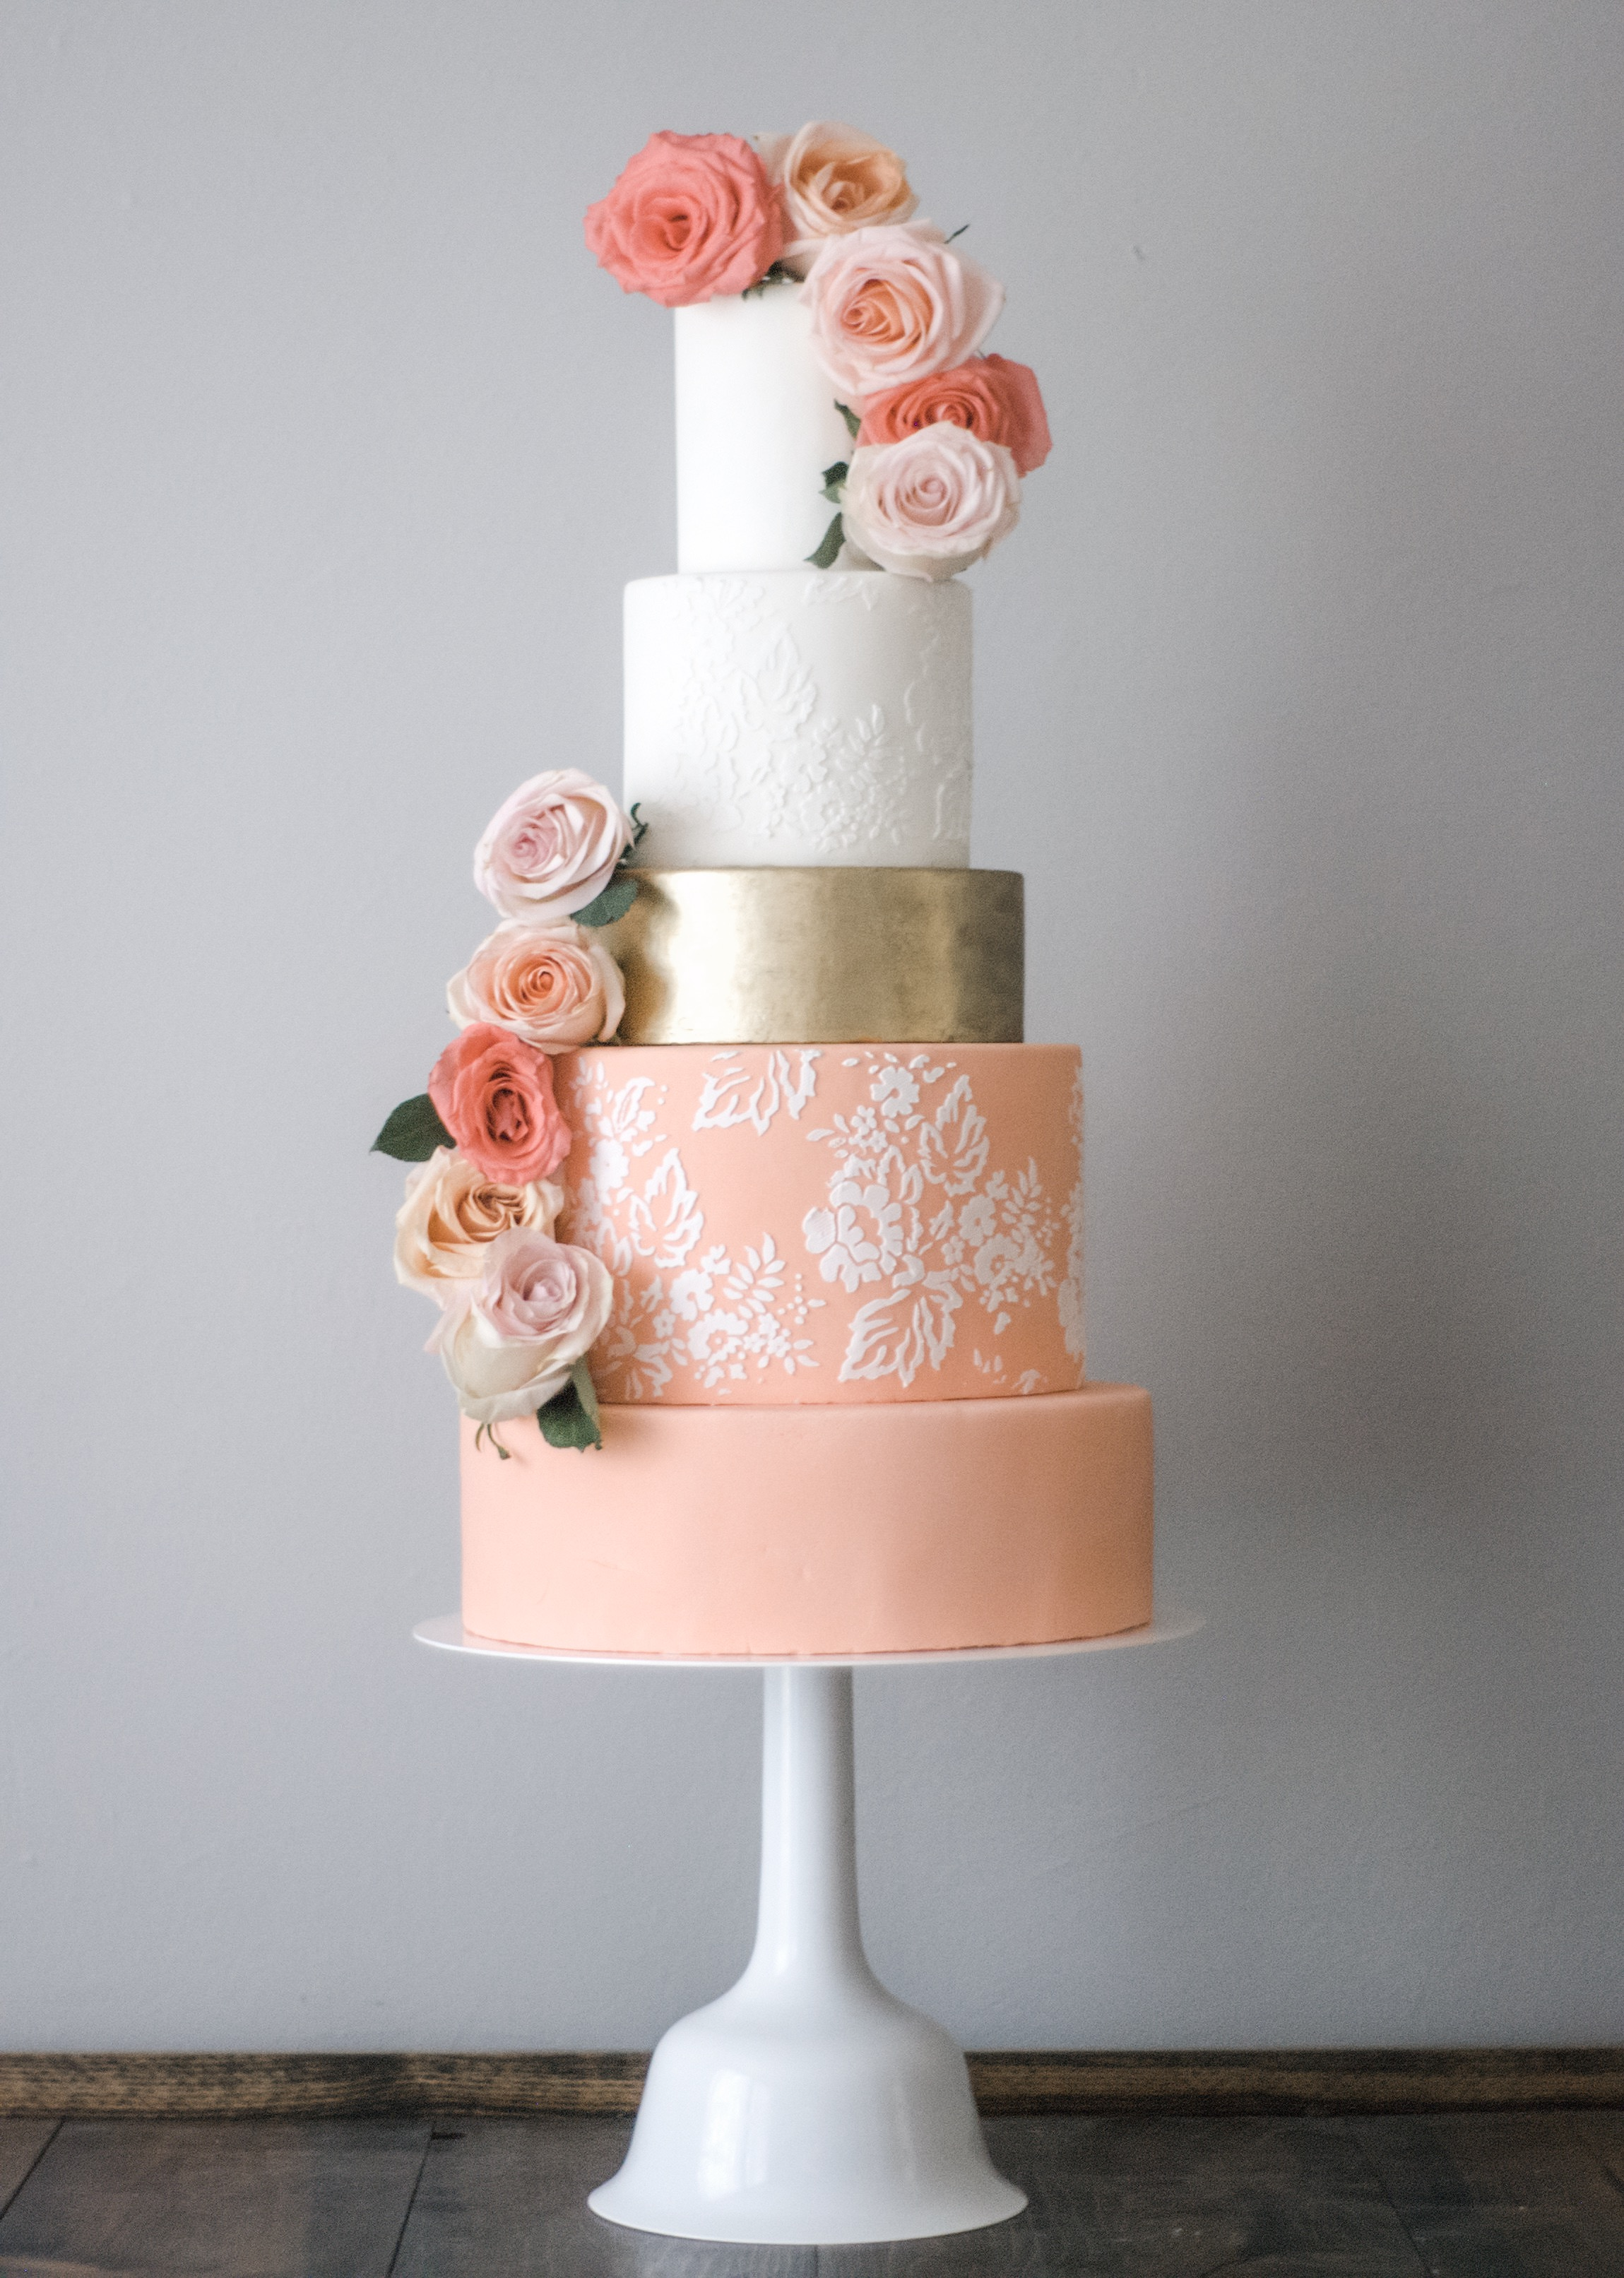 Peach coral gold Floral wedding Cake + destination wedding coordinator epoch co austin houston dallas fort worth college station texas